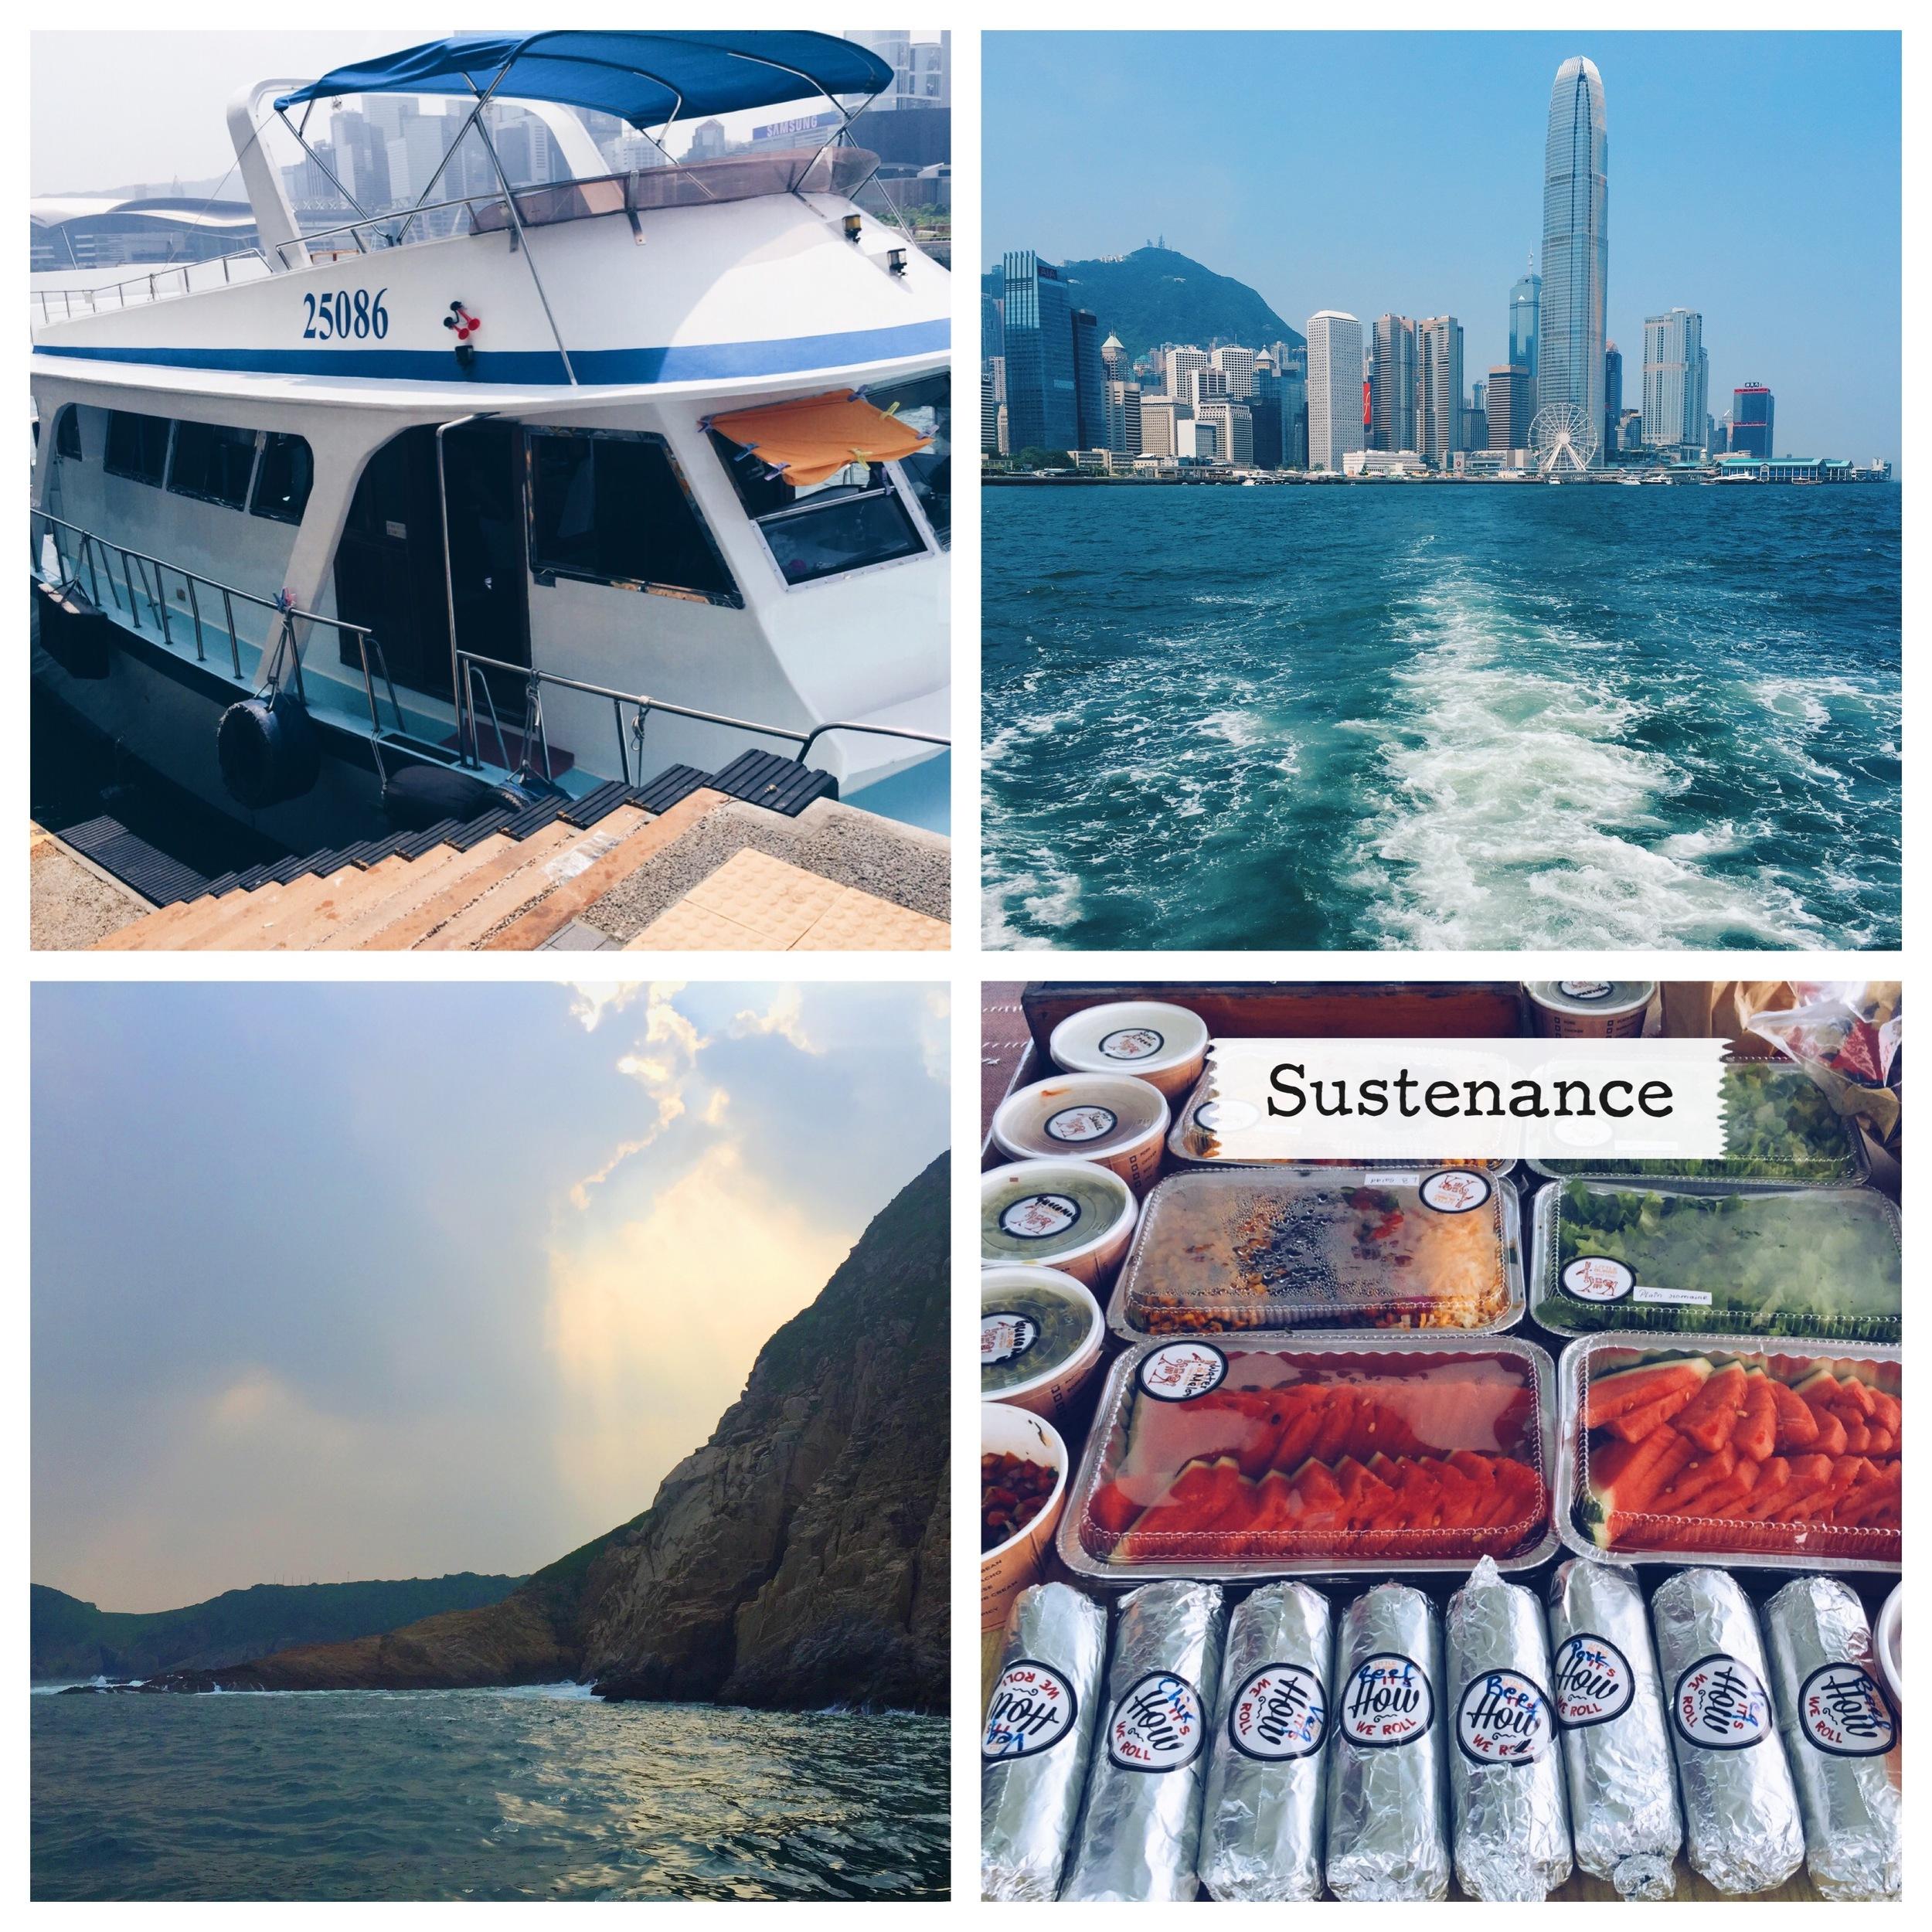 Sailing through the South China Sea